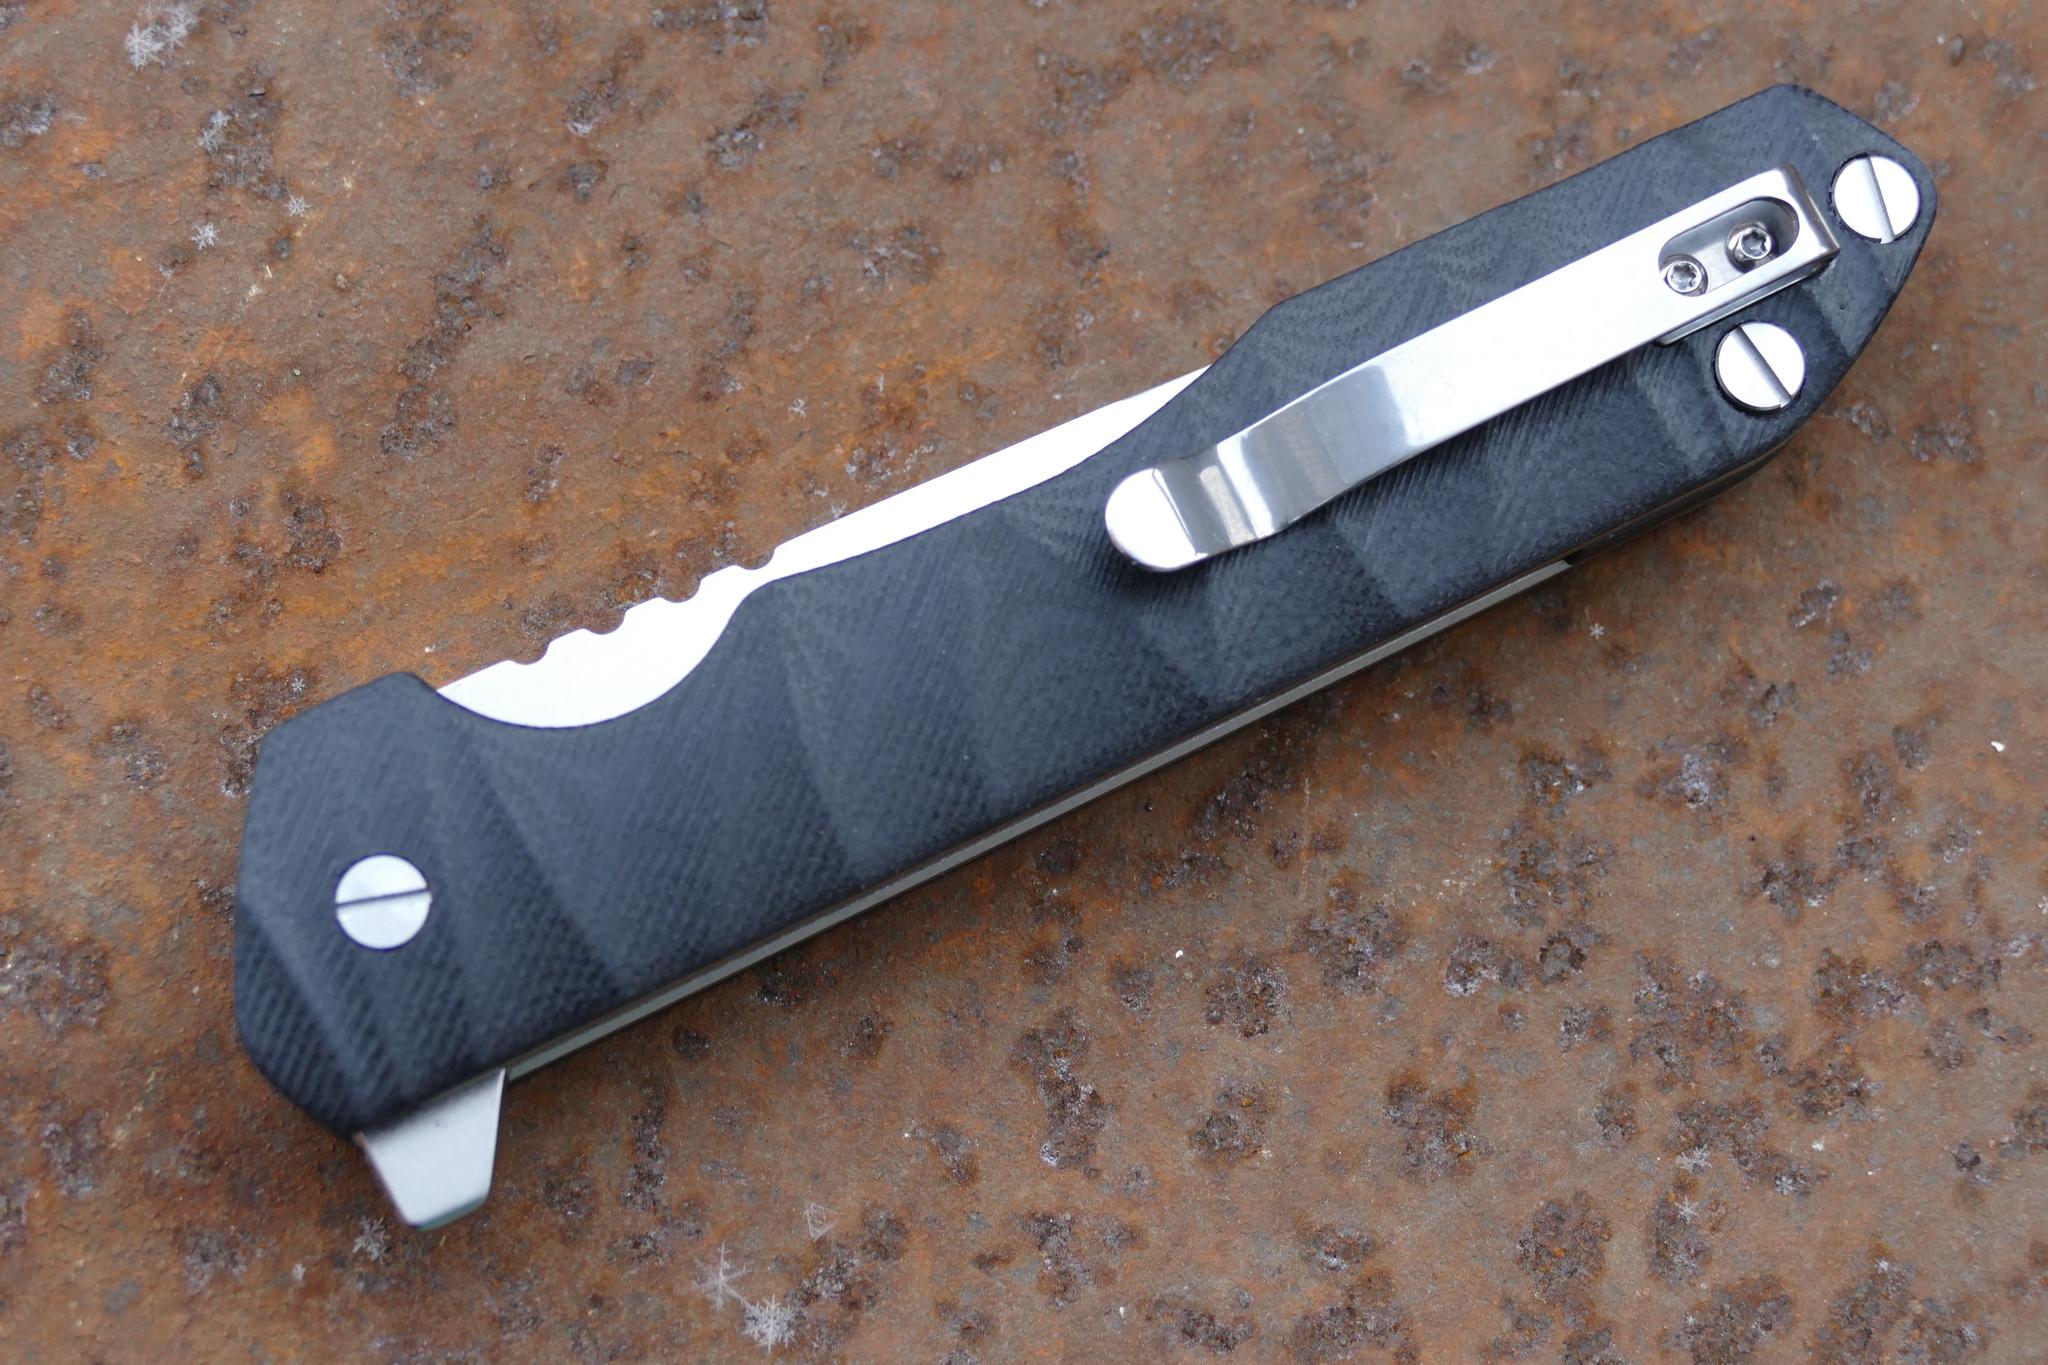 Фото 20 - Складной нож Rassenti 1, D2 от Steelclaw